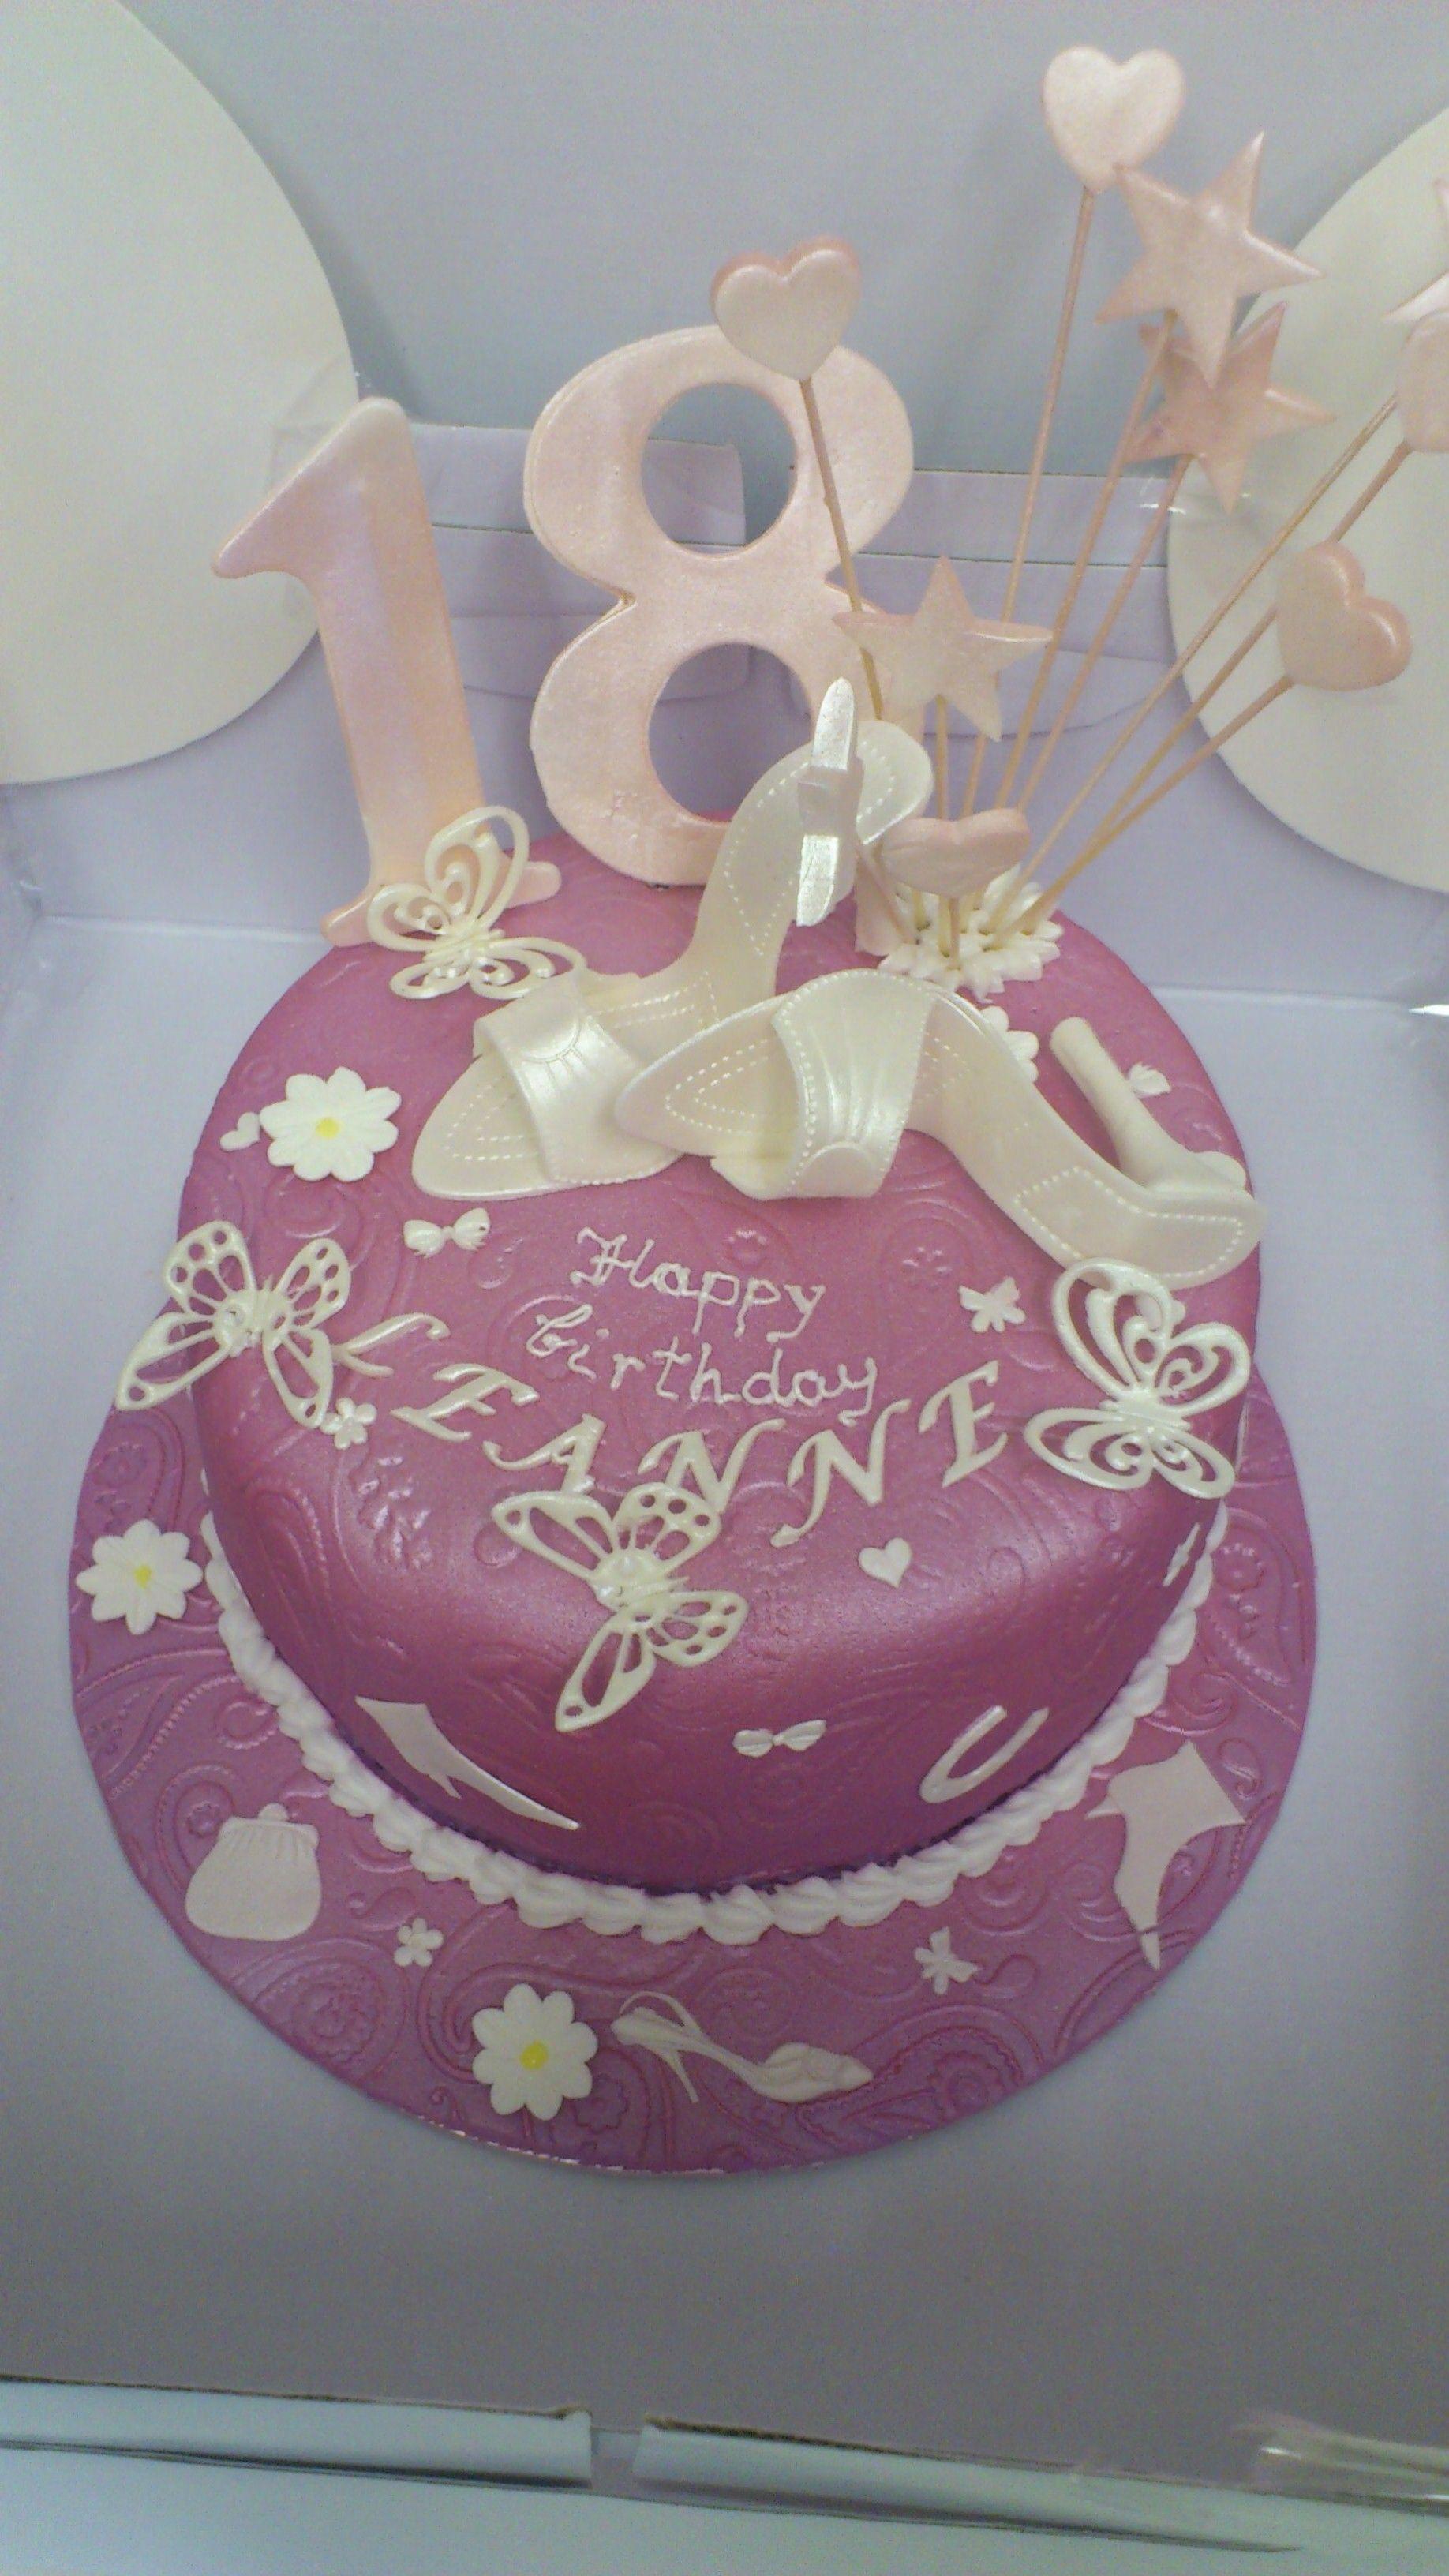 18th birthday cake 18th birthday cake 18th birthday